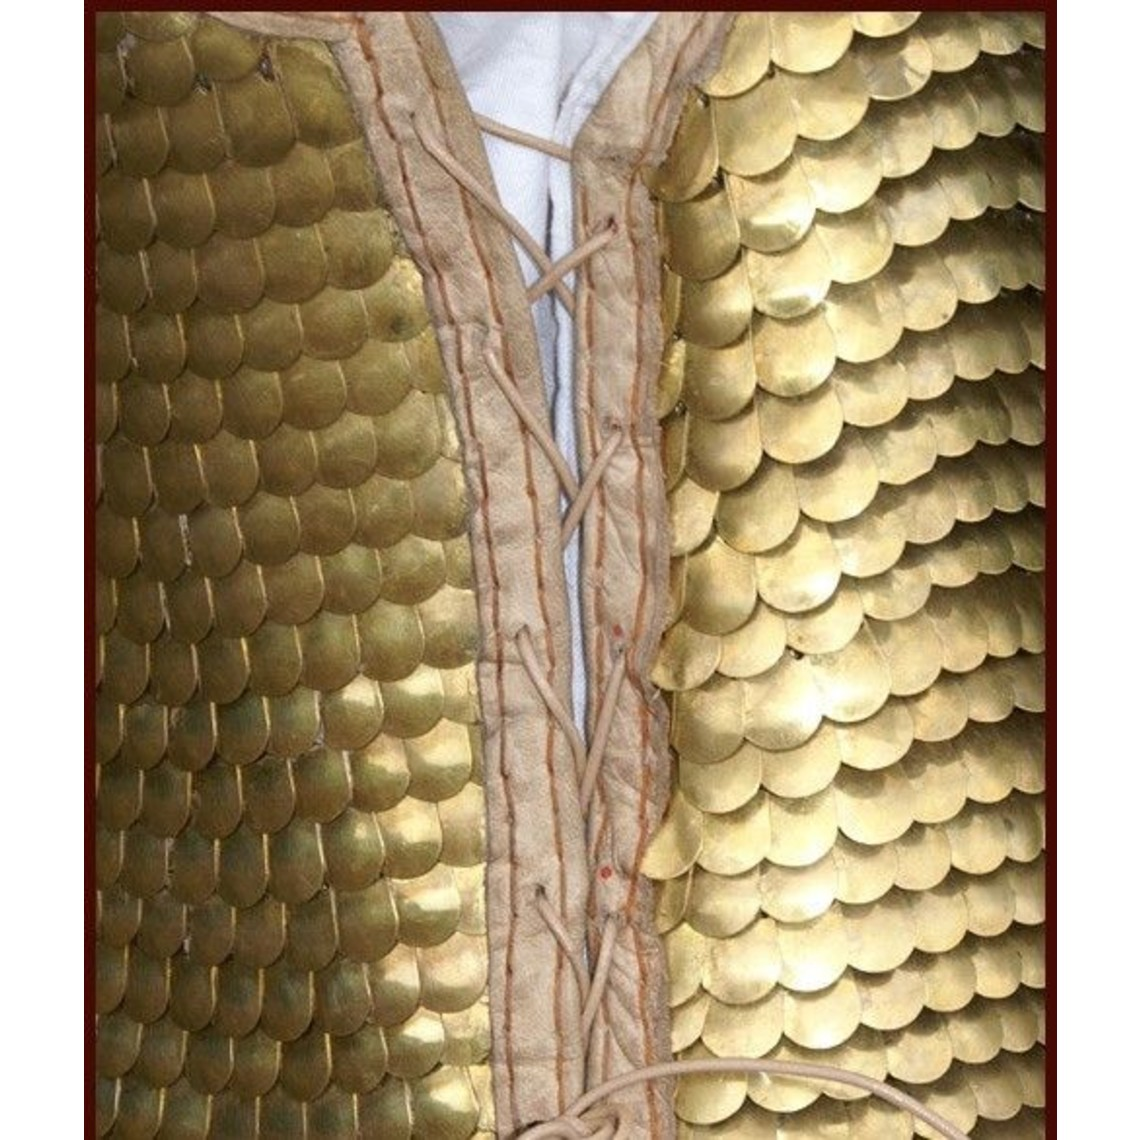 Deepeeka Lorica Squamata